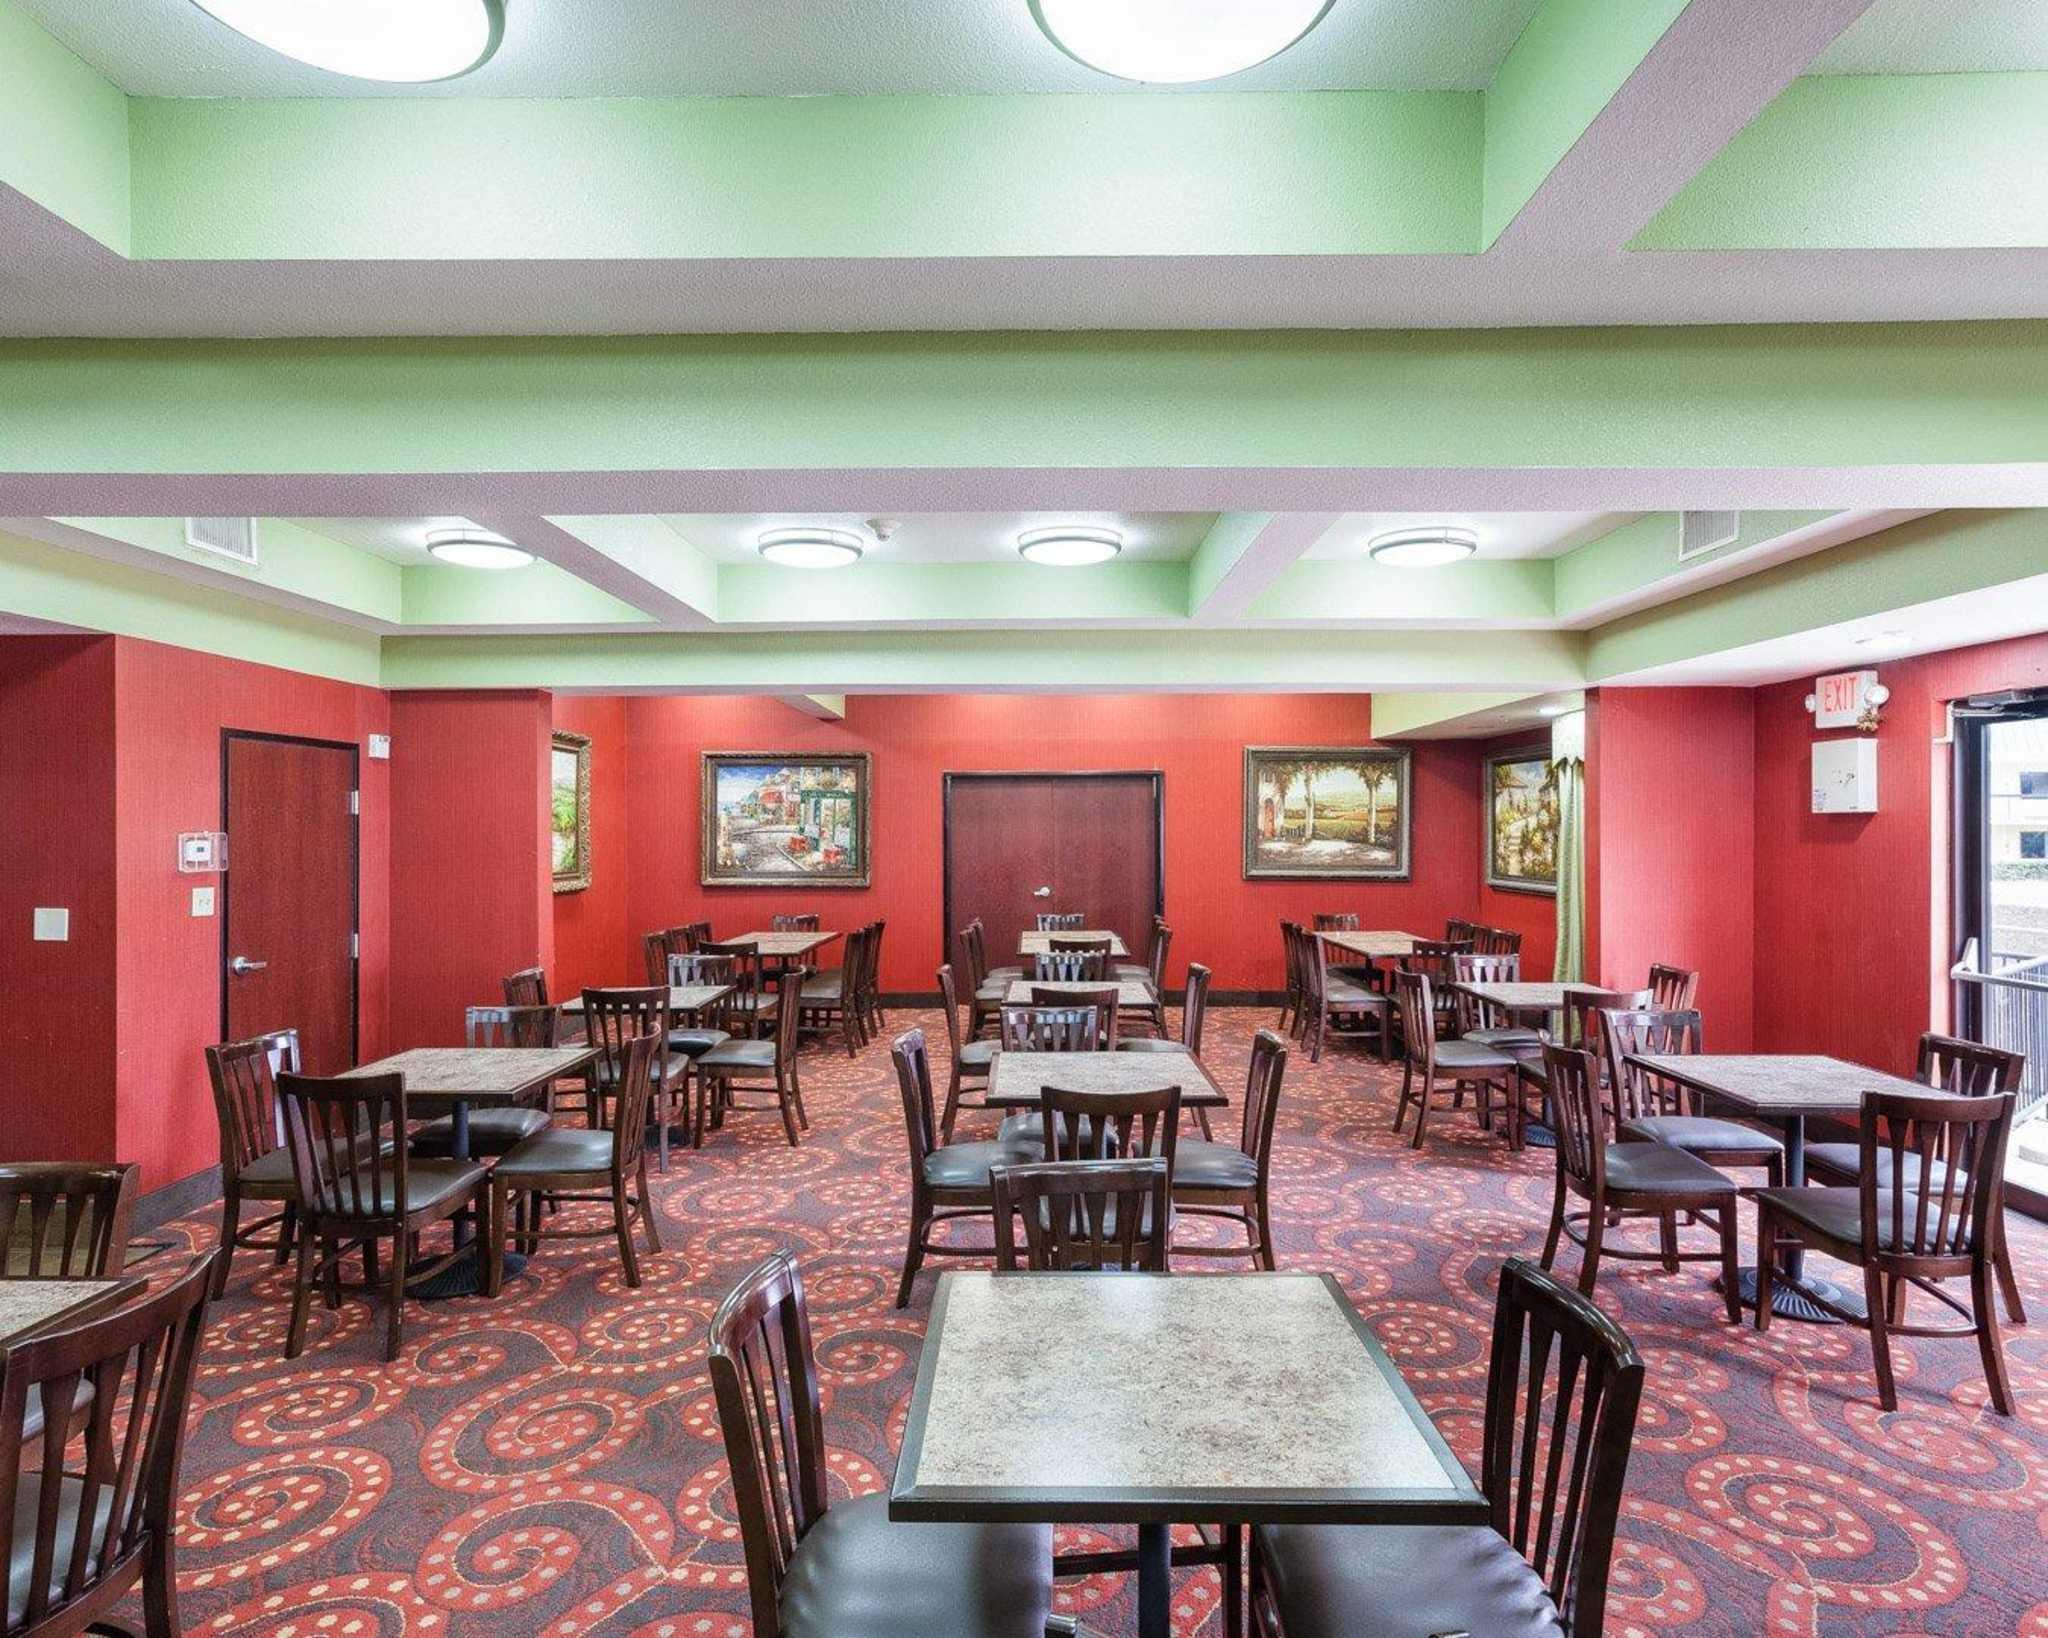 Comfort Inn & Suites Near Medical Center image 15